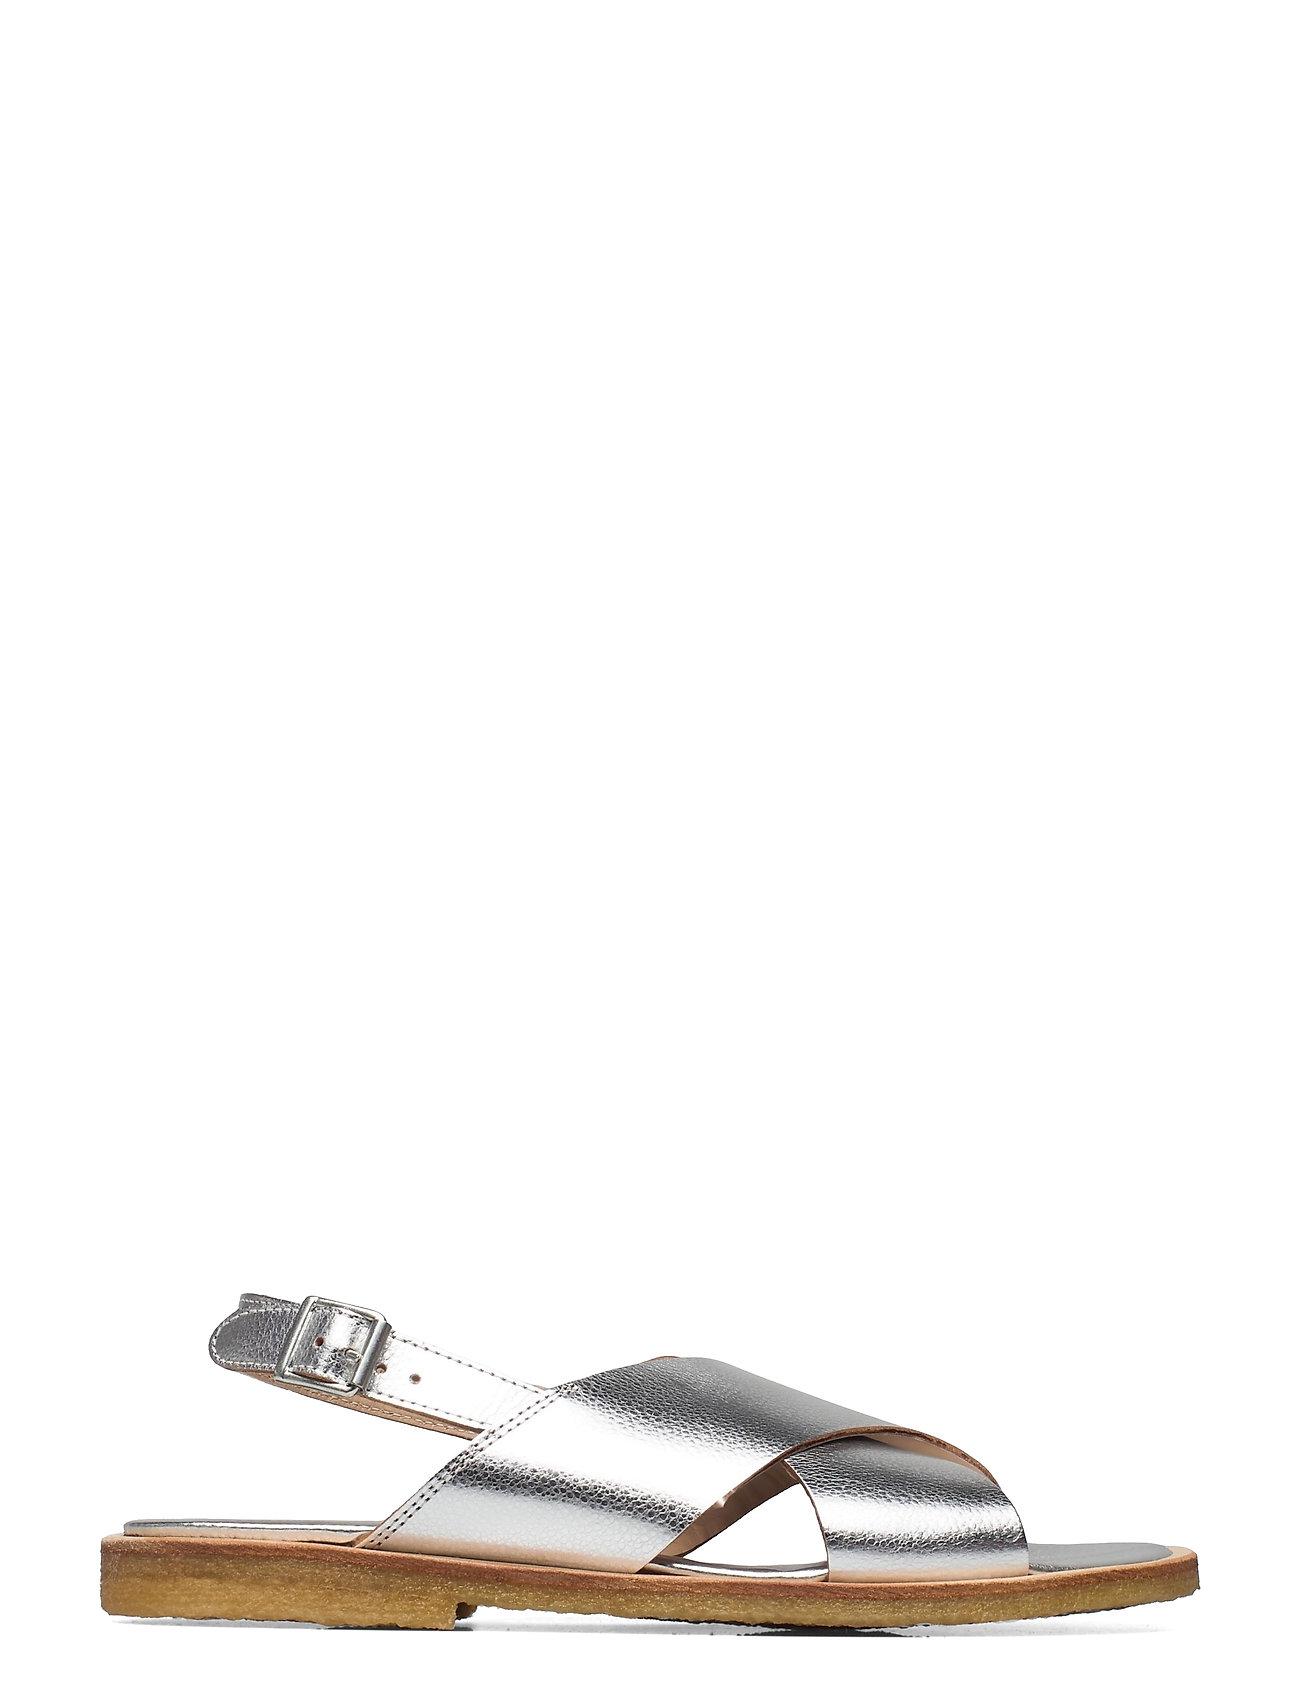 Sandals - Flat - Open Toe - Op Shoes Summer Shoes Flat Sandals Sølv ANGULUS